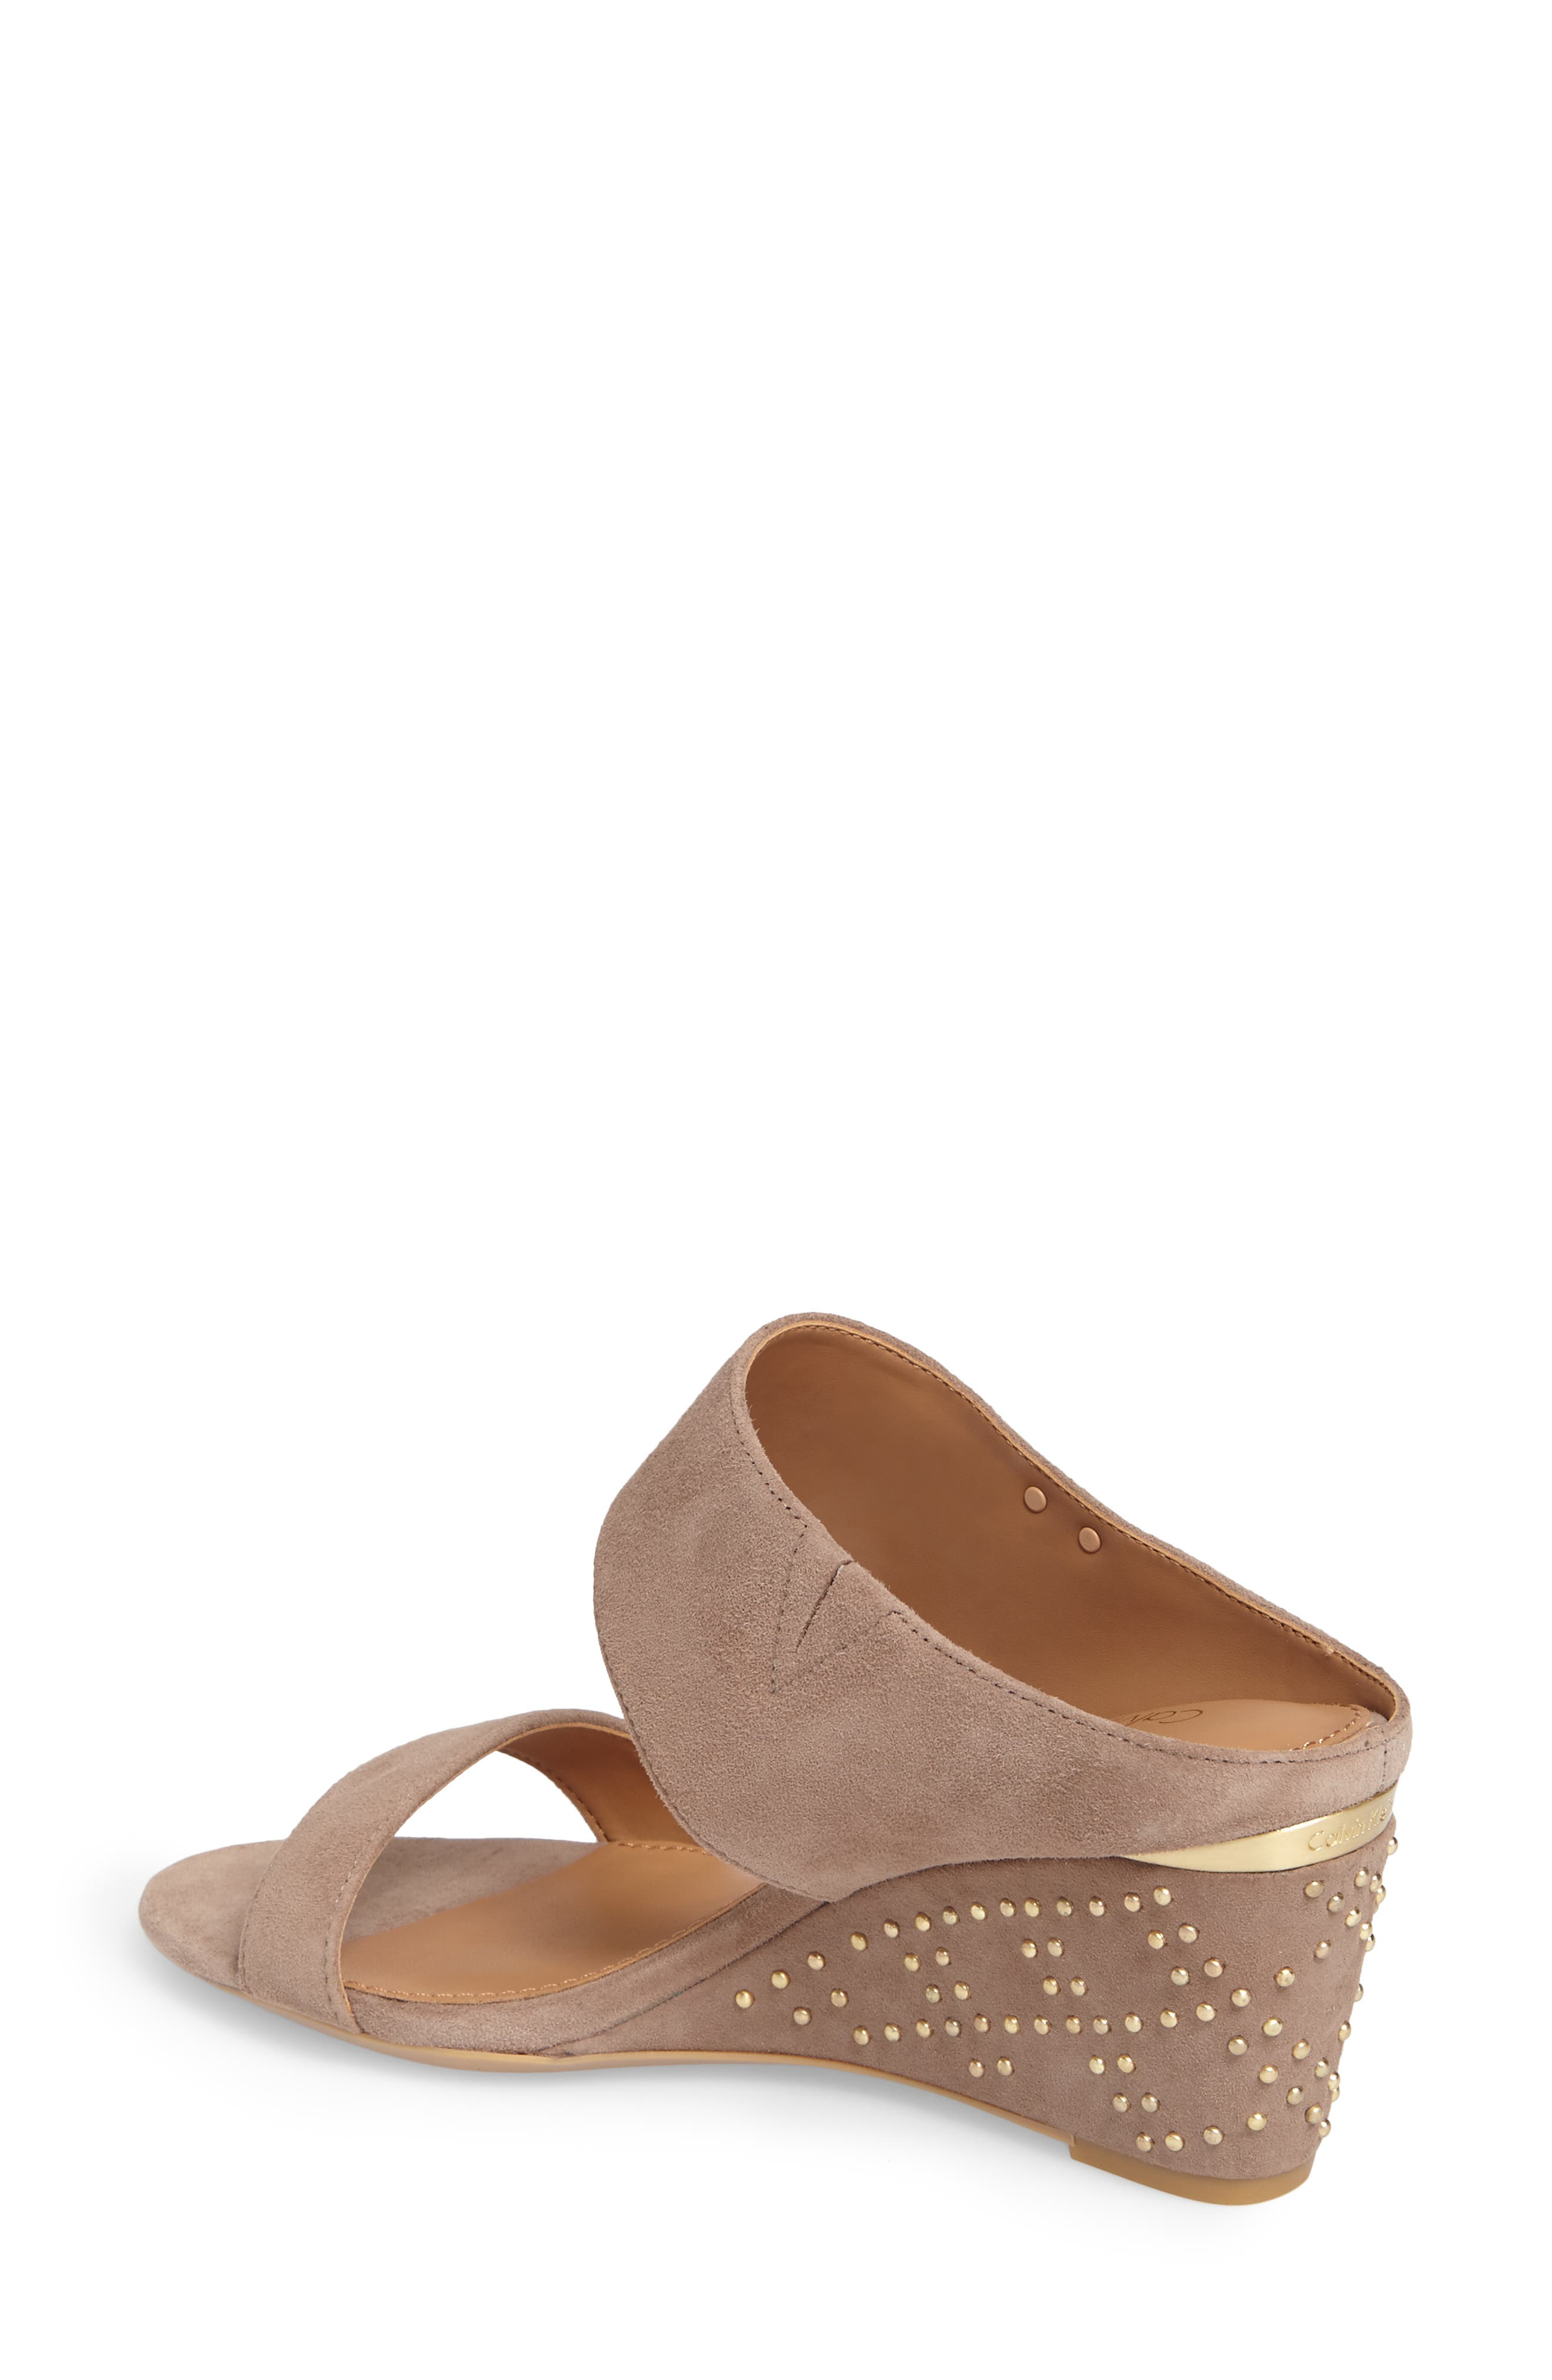 Phyllis Studded Wedge Sandal,                             Alternate thumbnail 6, color,